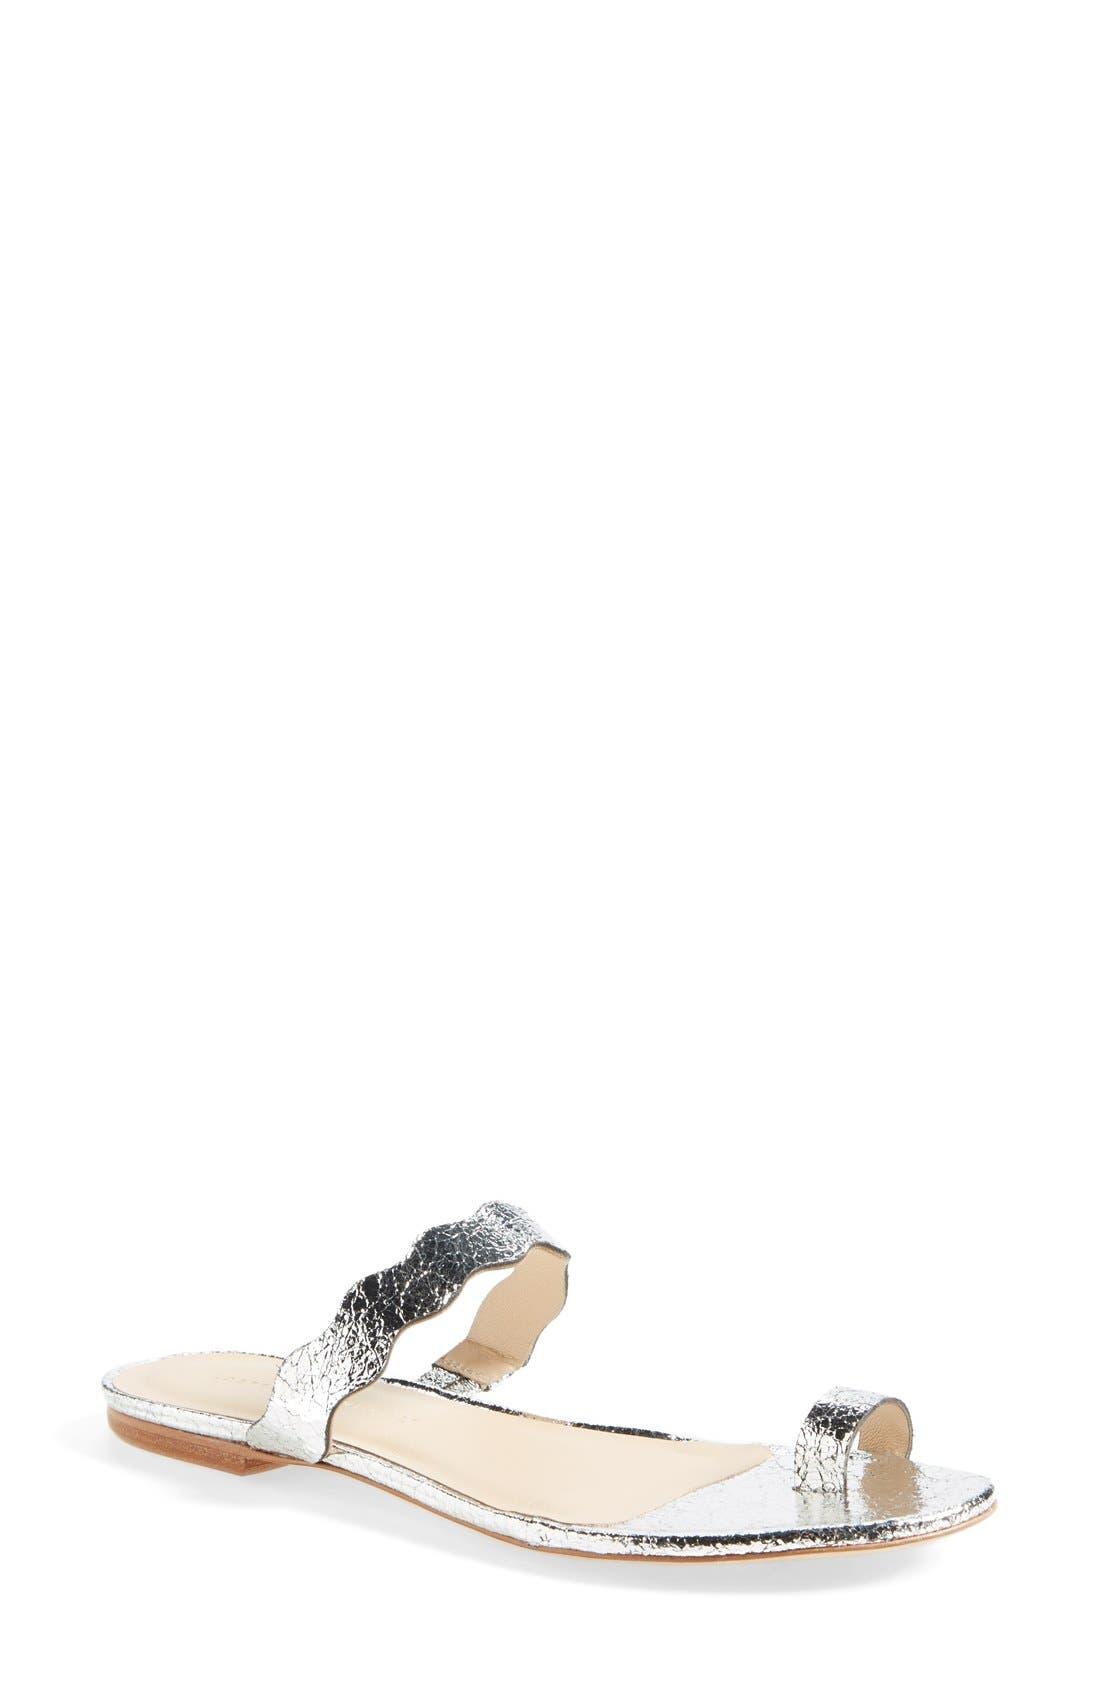 'Petal' Slide Sandal, Main, color, 040